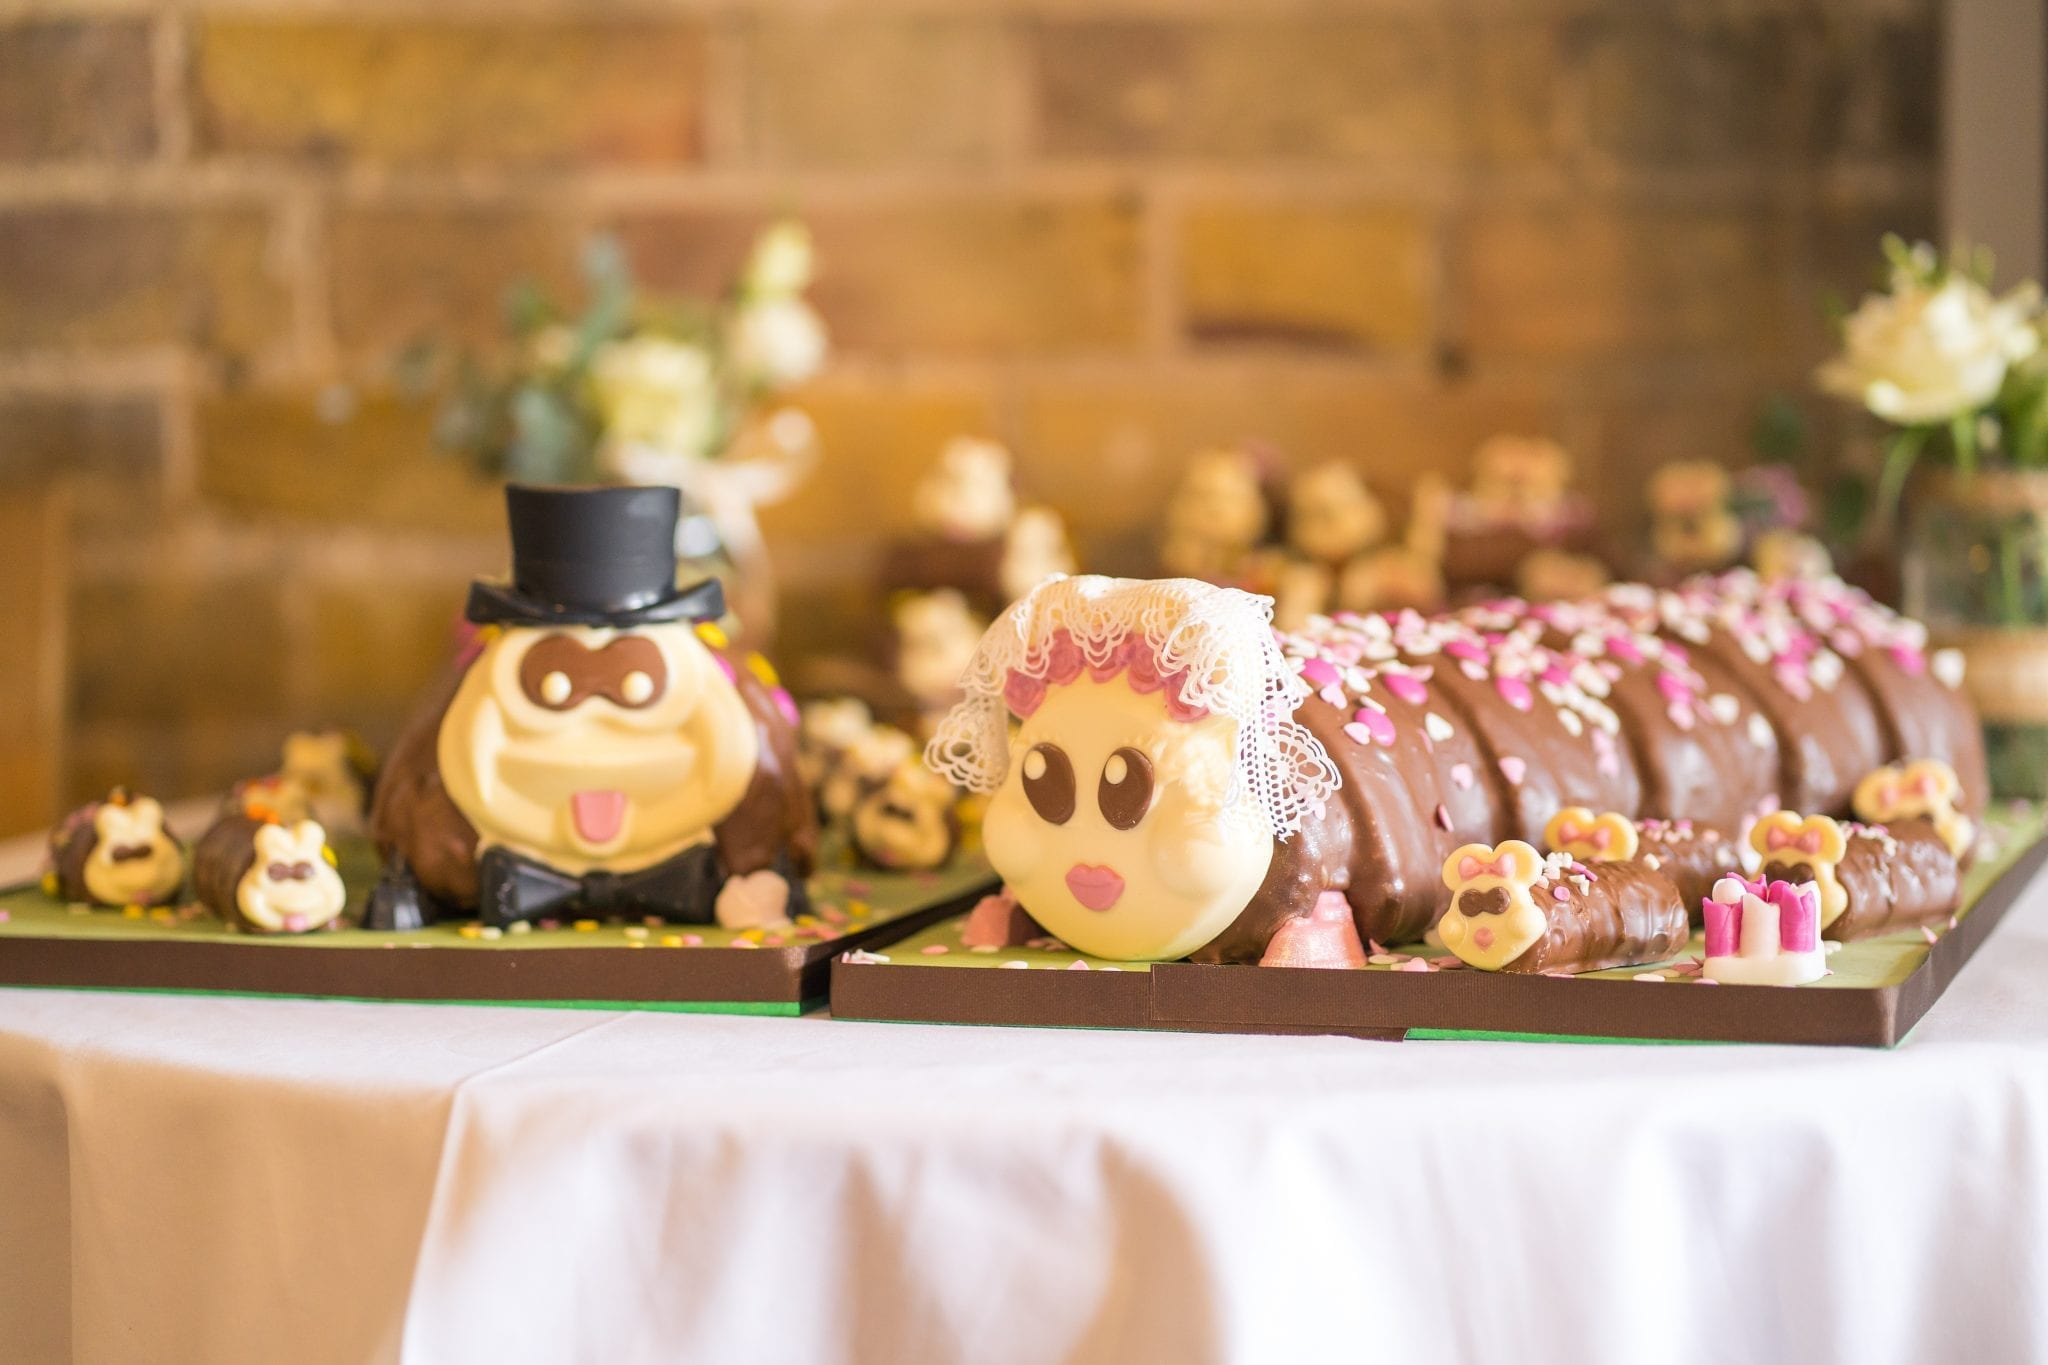 Wedding Cake - Contemporary Mr & Mrs Catepillar